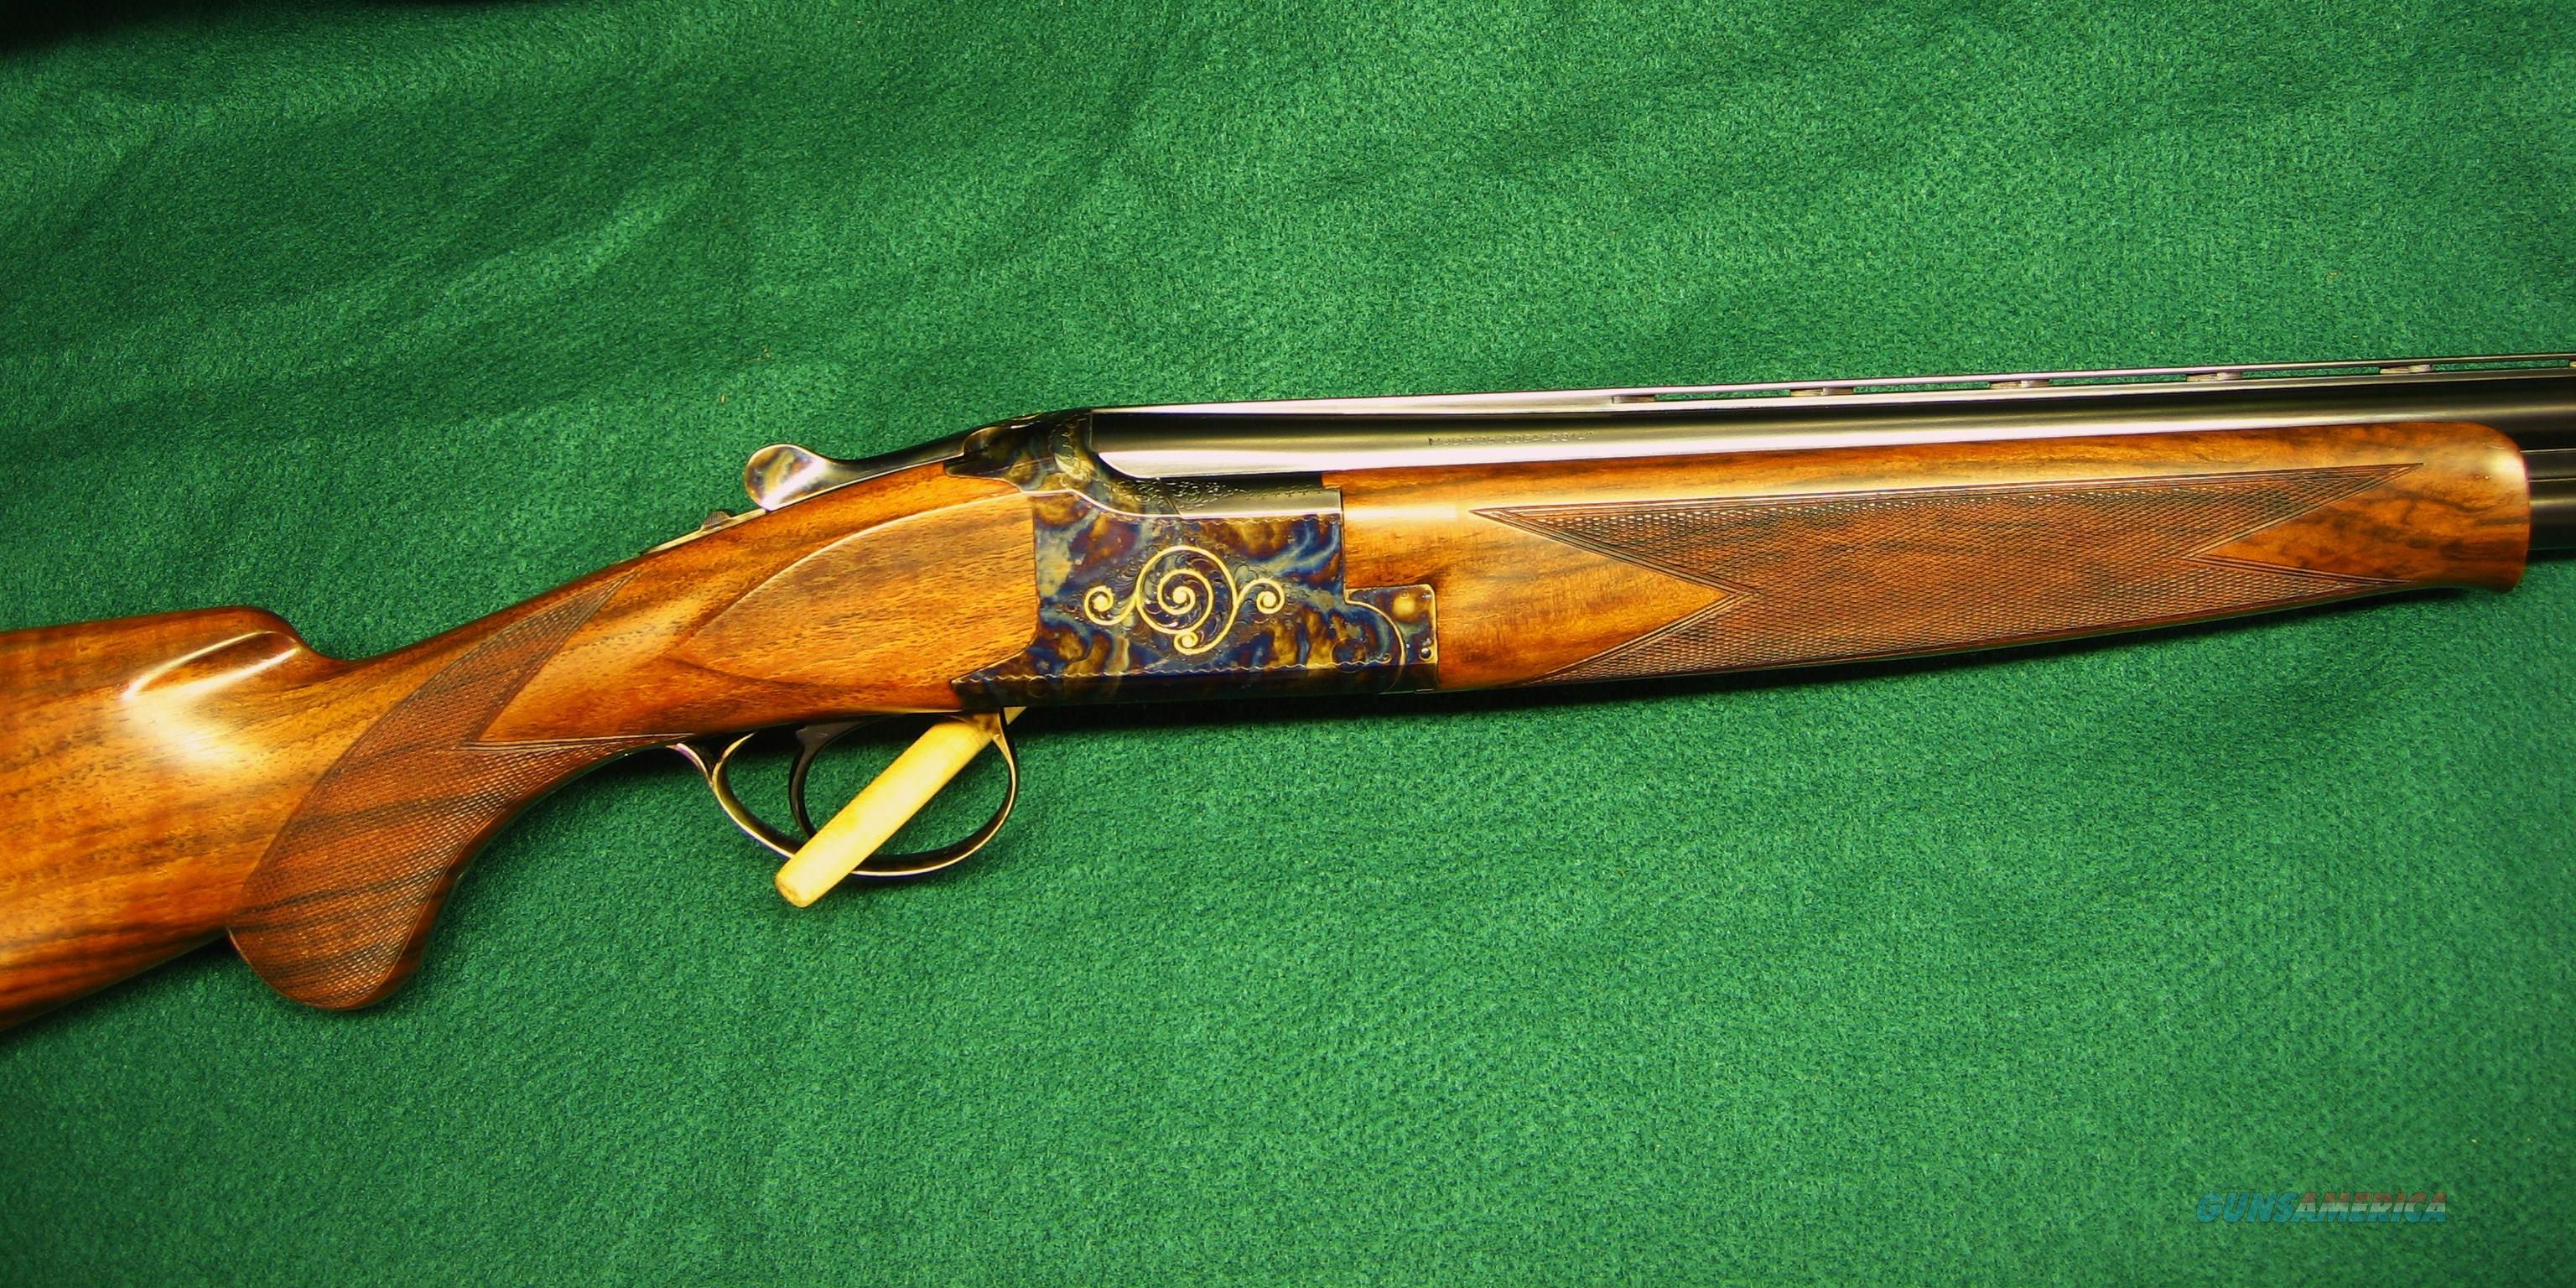 BROWNING B25 SUPERPOSED TRADITIONAL 20 GA  Guns > Shotguns > Browning Shotguns > Over Unders > Belgian Manufacture